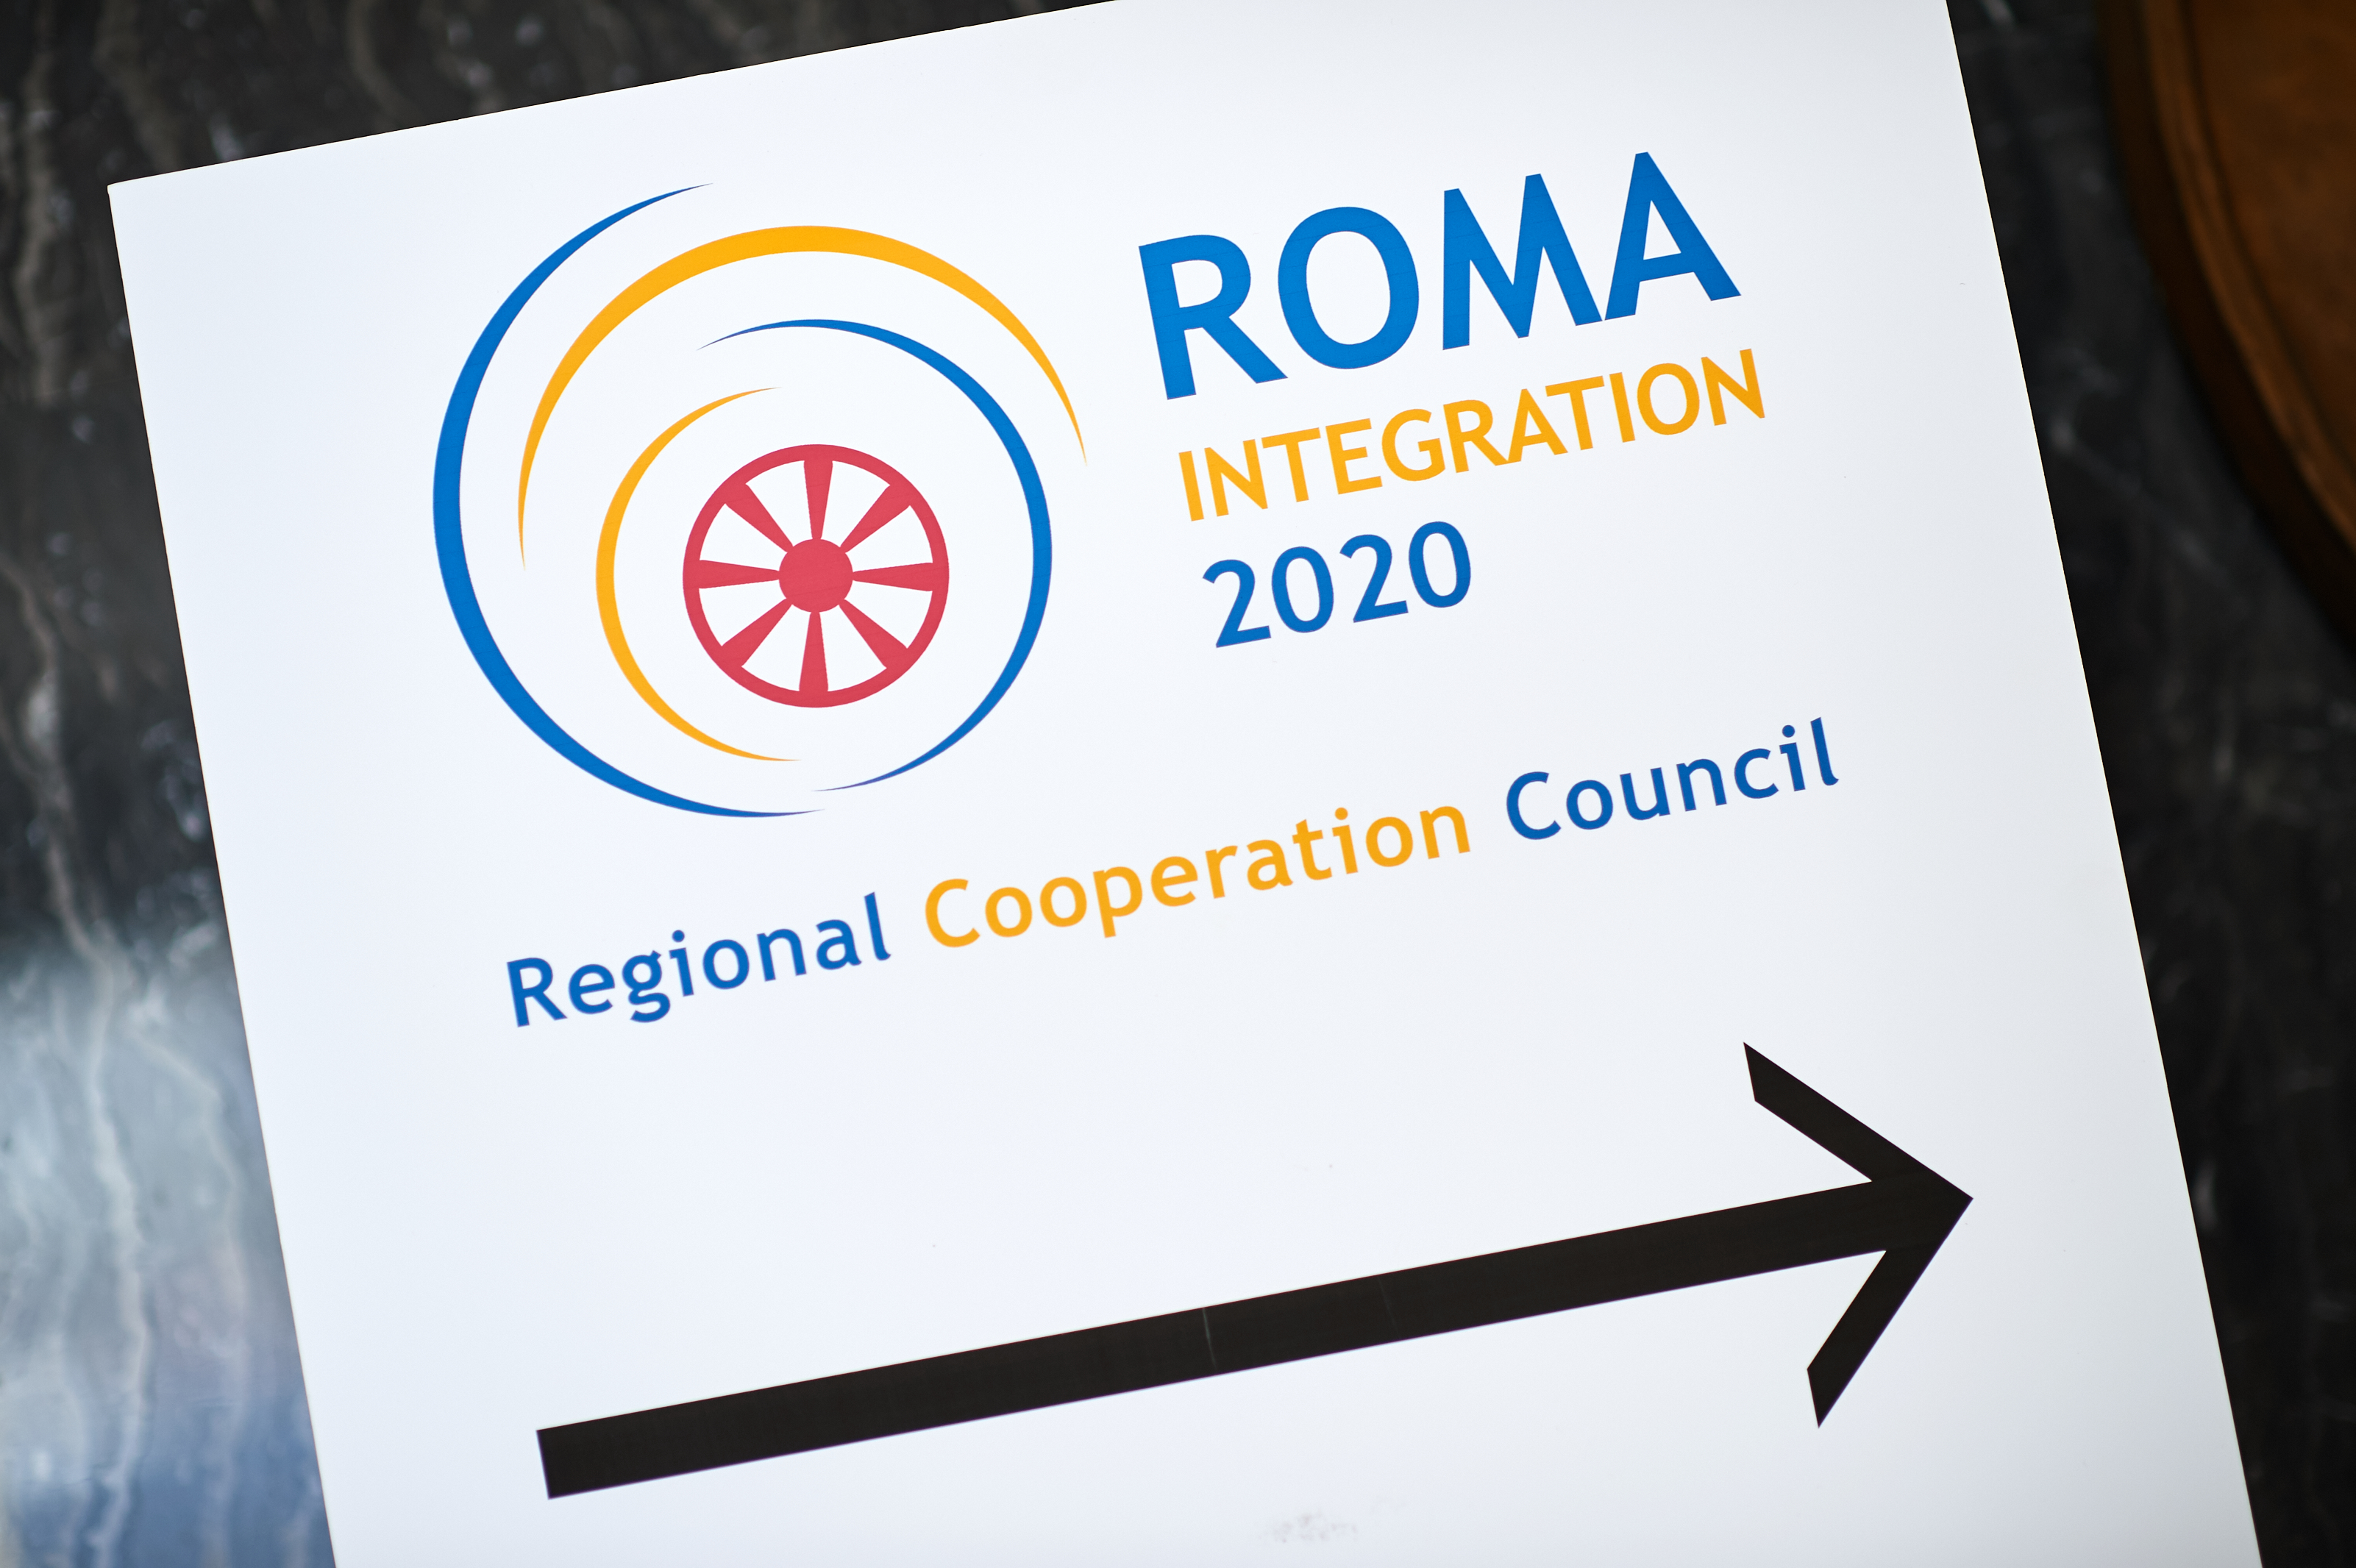 Roma Integration 2020